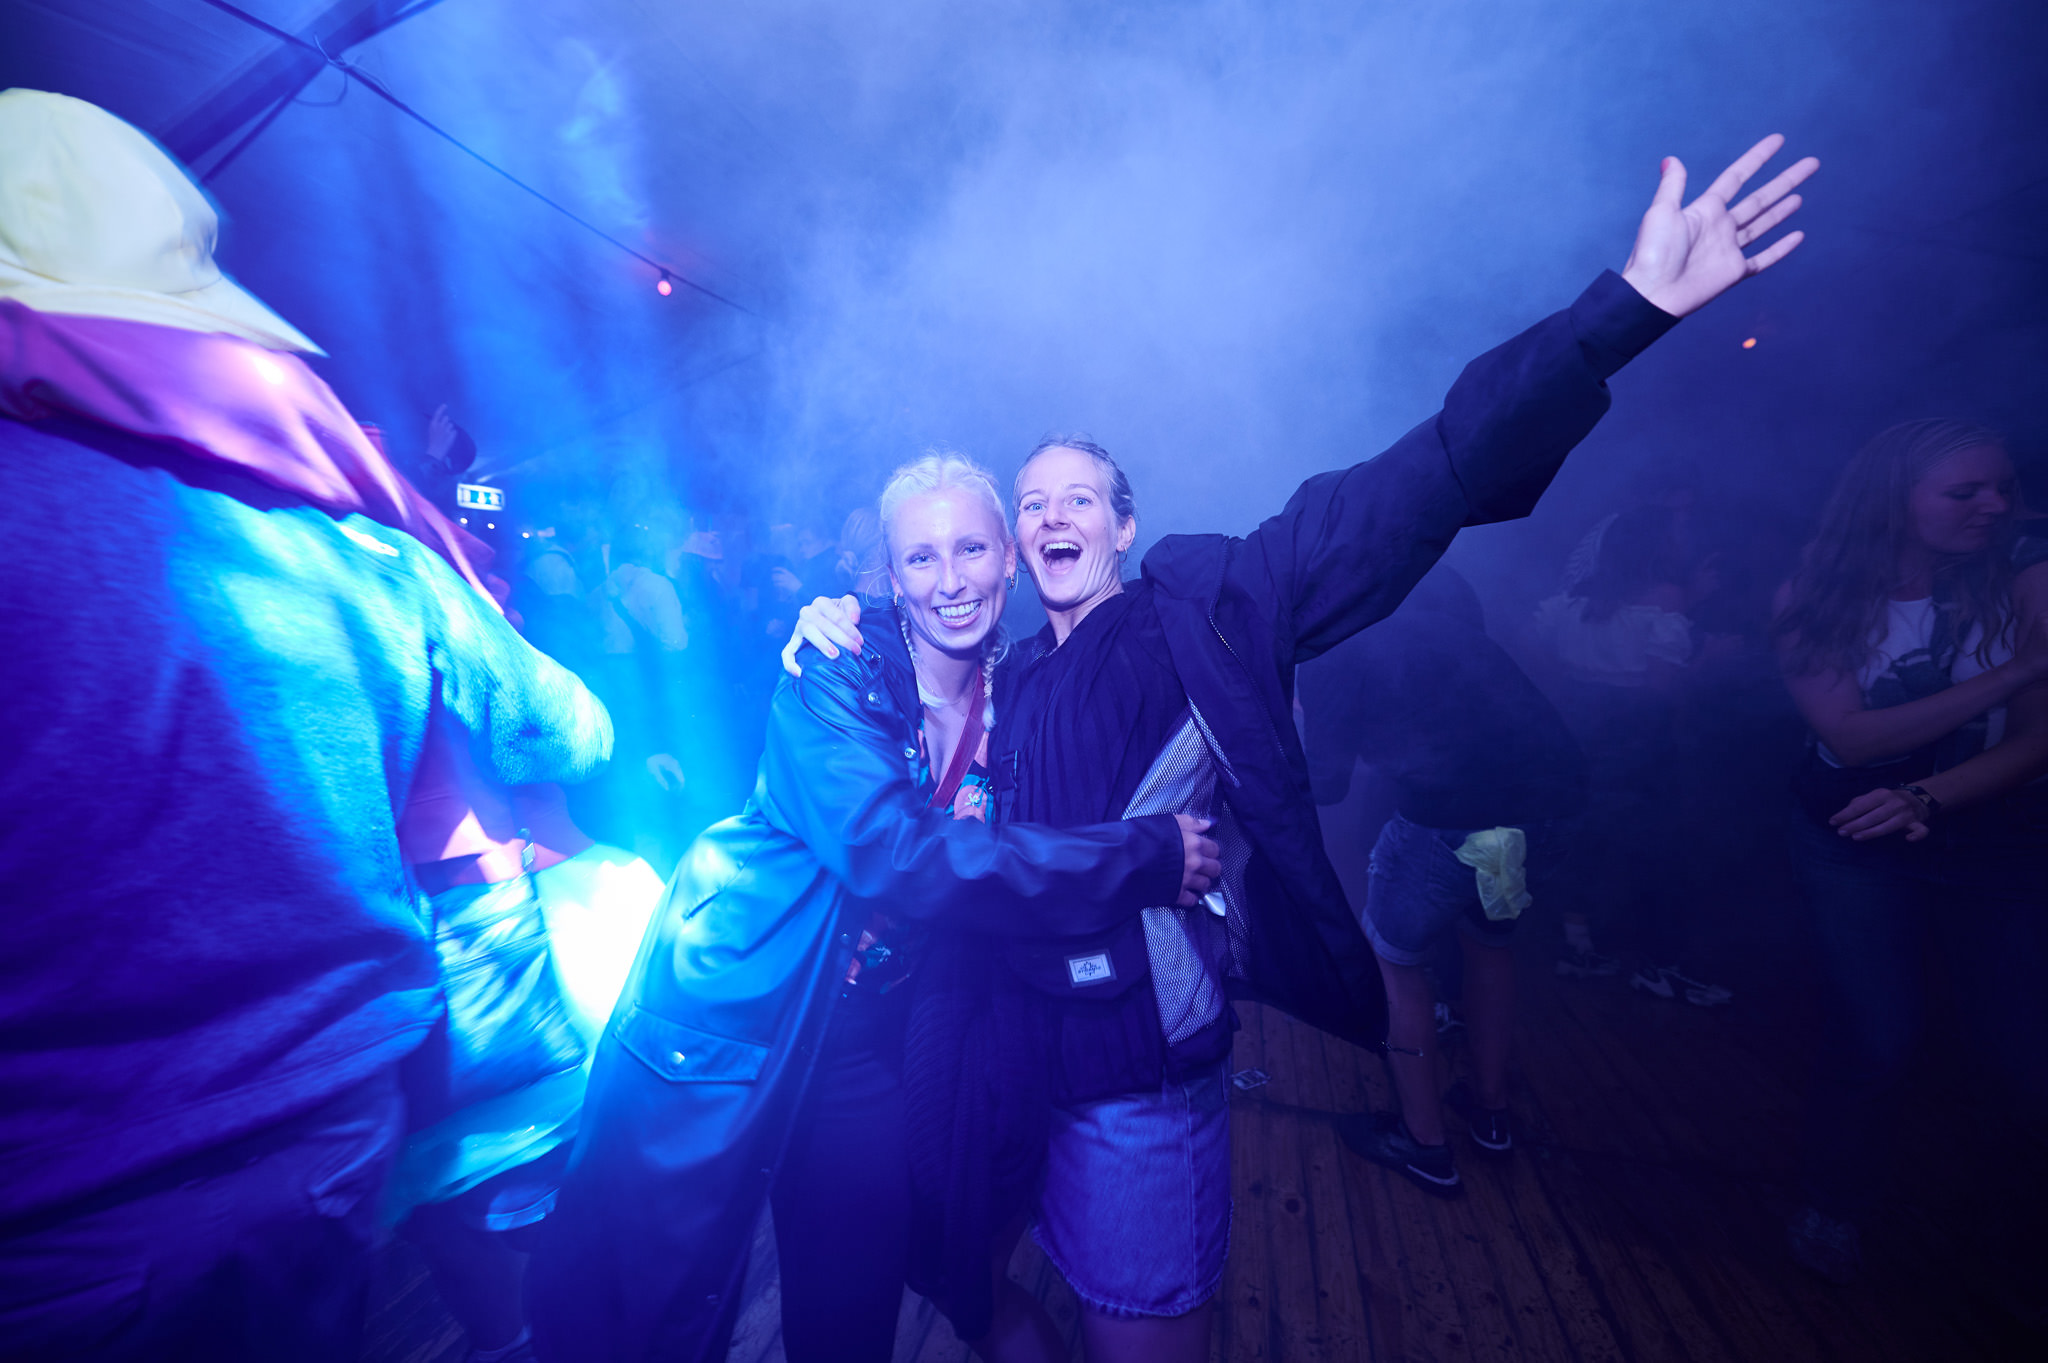 Smukfest har DK's bedste dansegulve